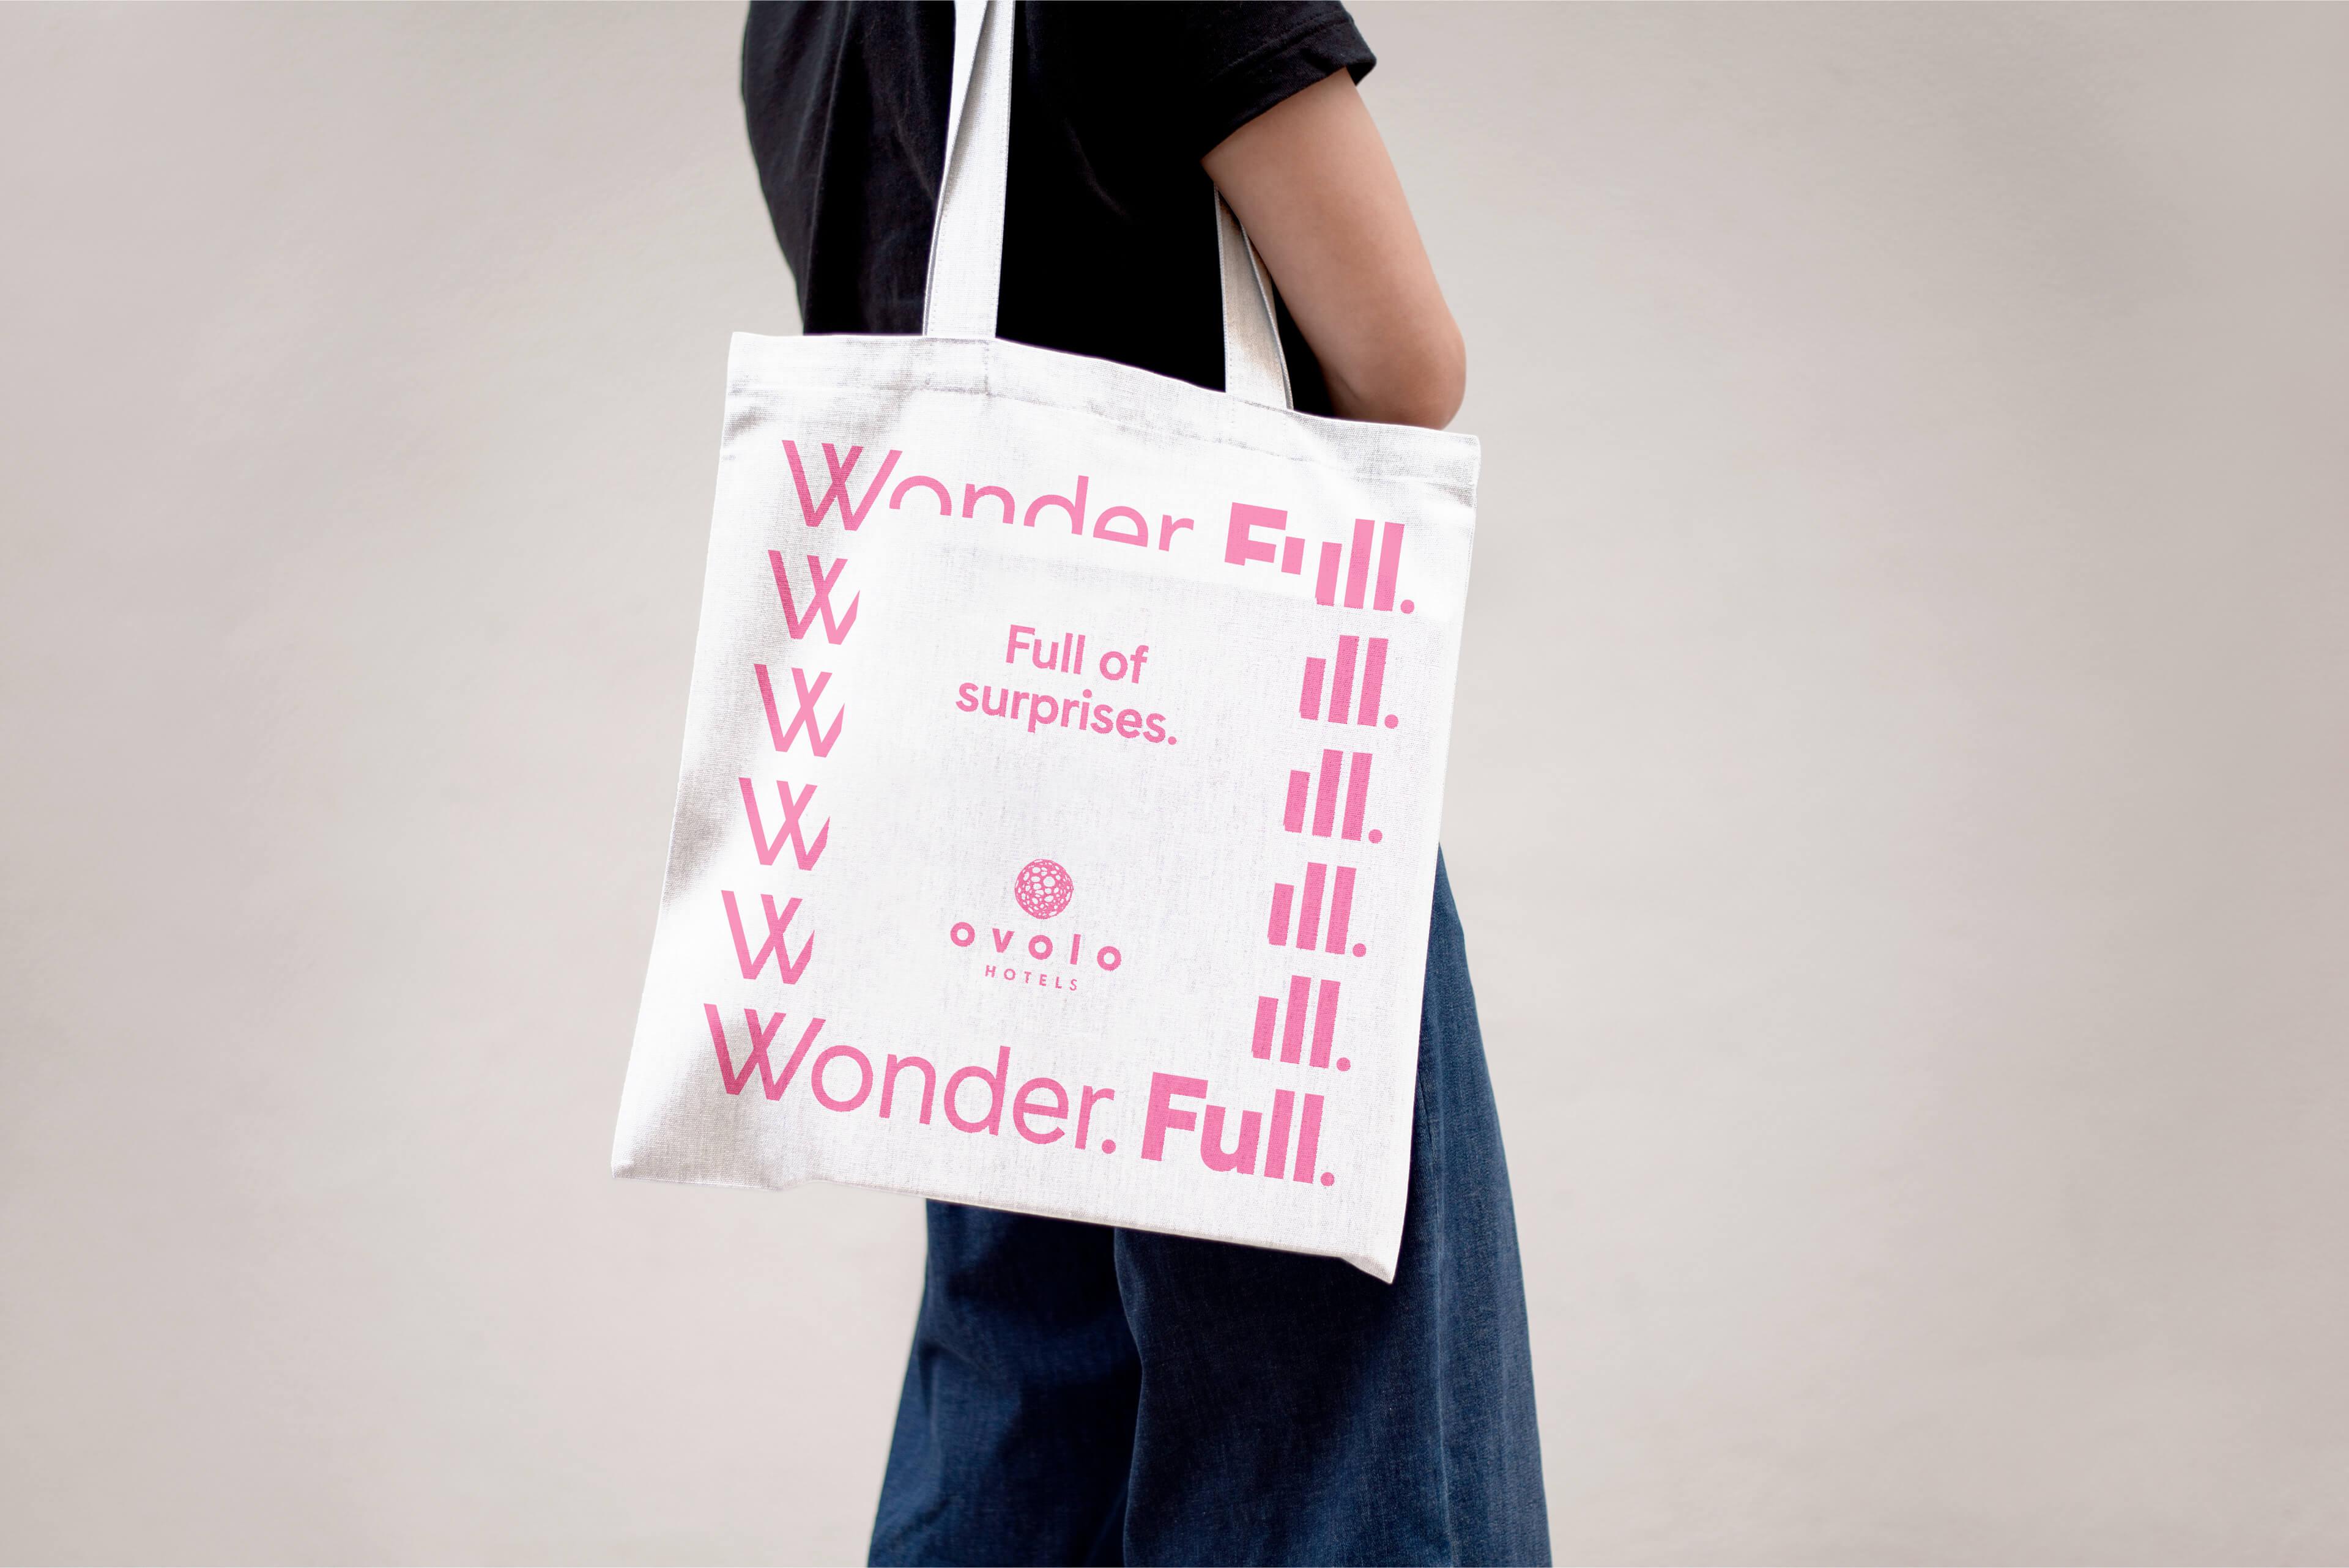 Ovolo Hotels Brand Refresh - Wonder. Full. Free Tote Bag